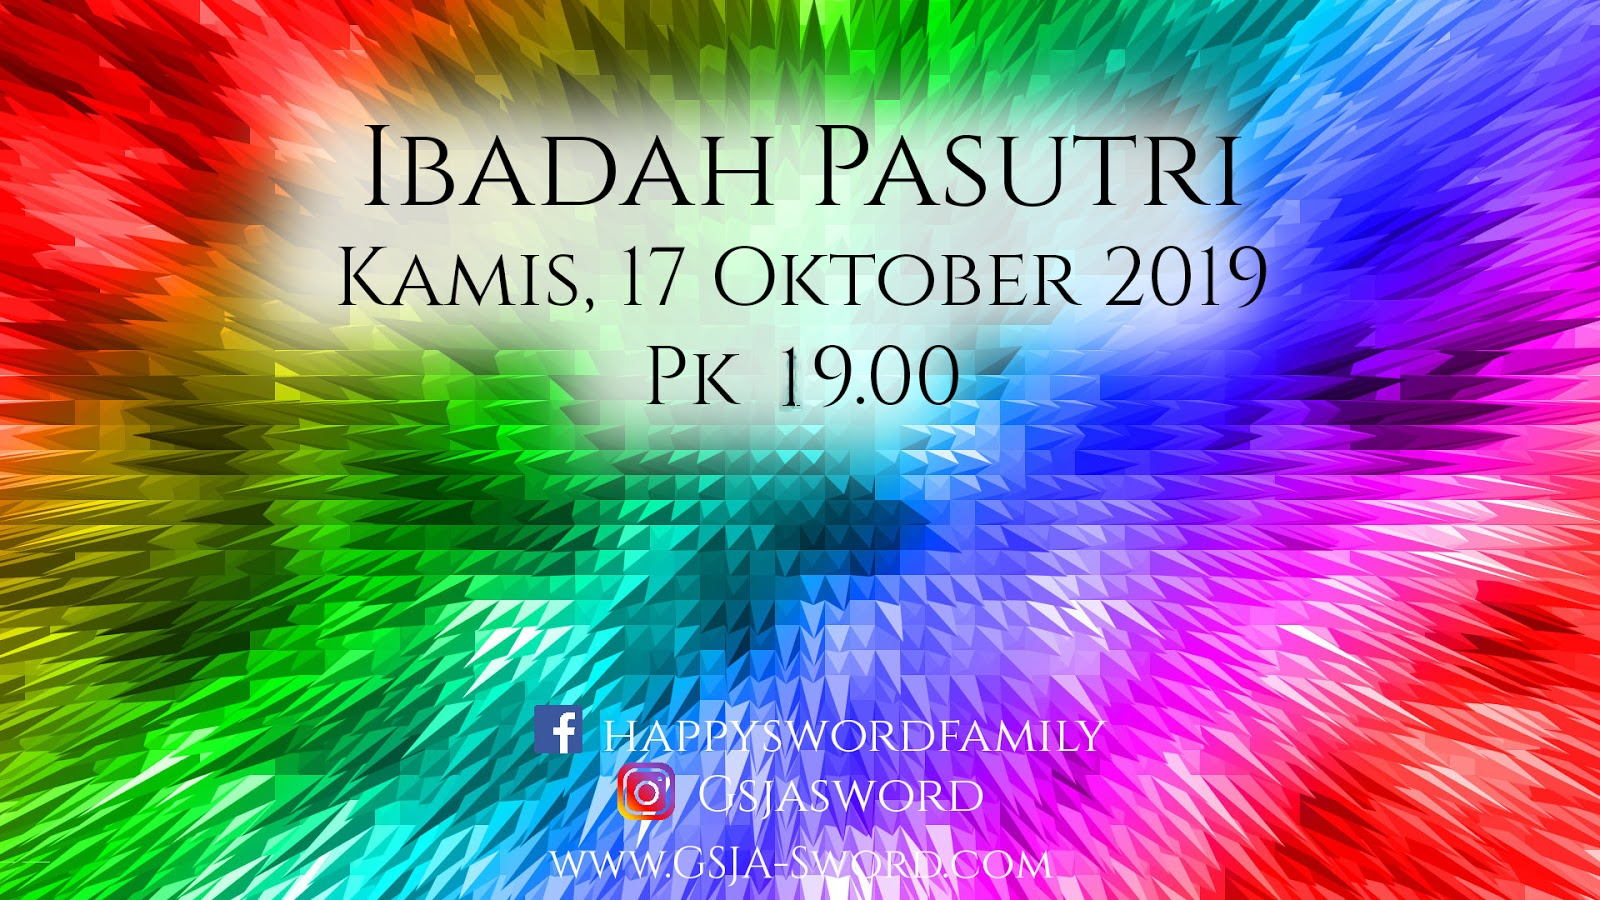 Ibadah Pasutri 17 Oktober 2019 Jam 19.00 WIB